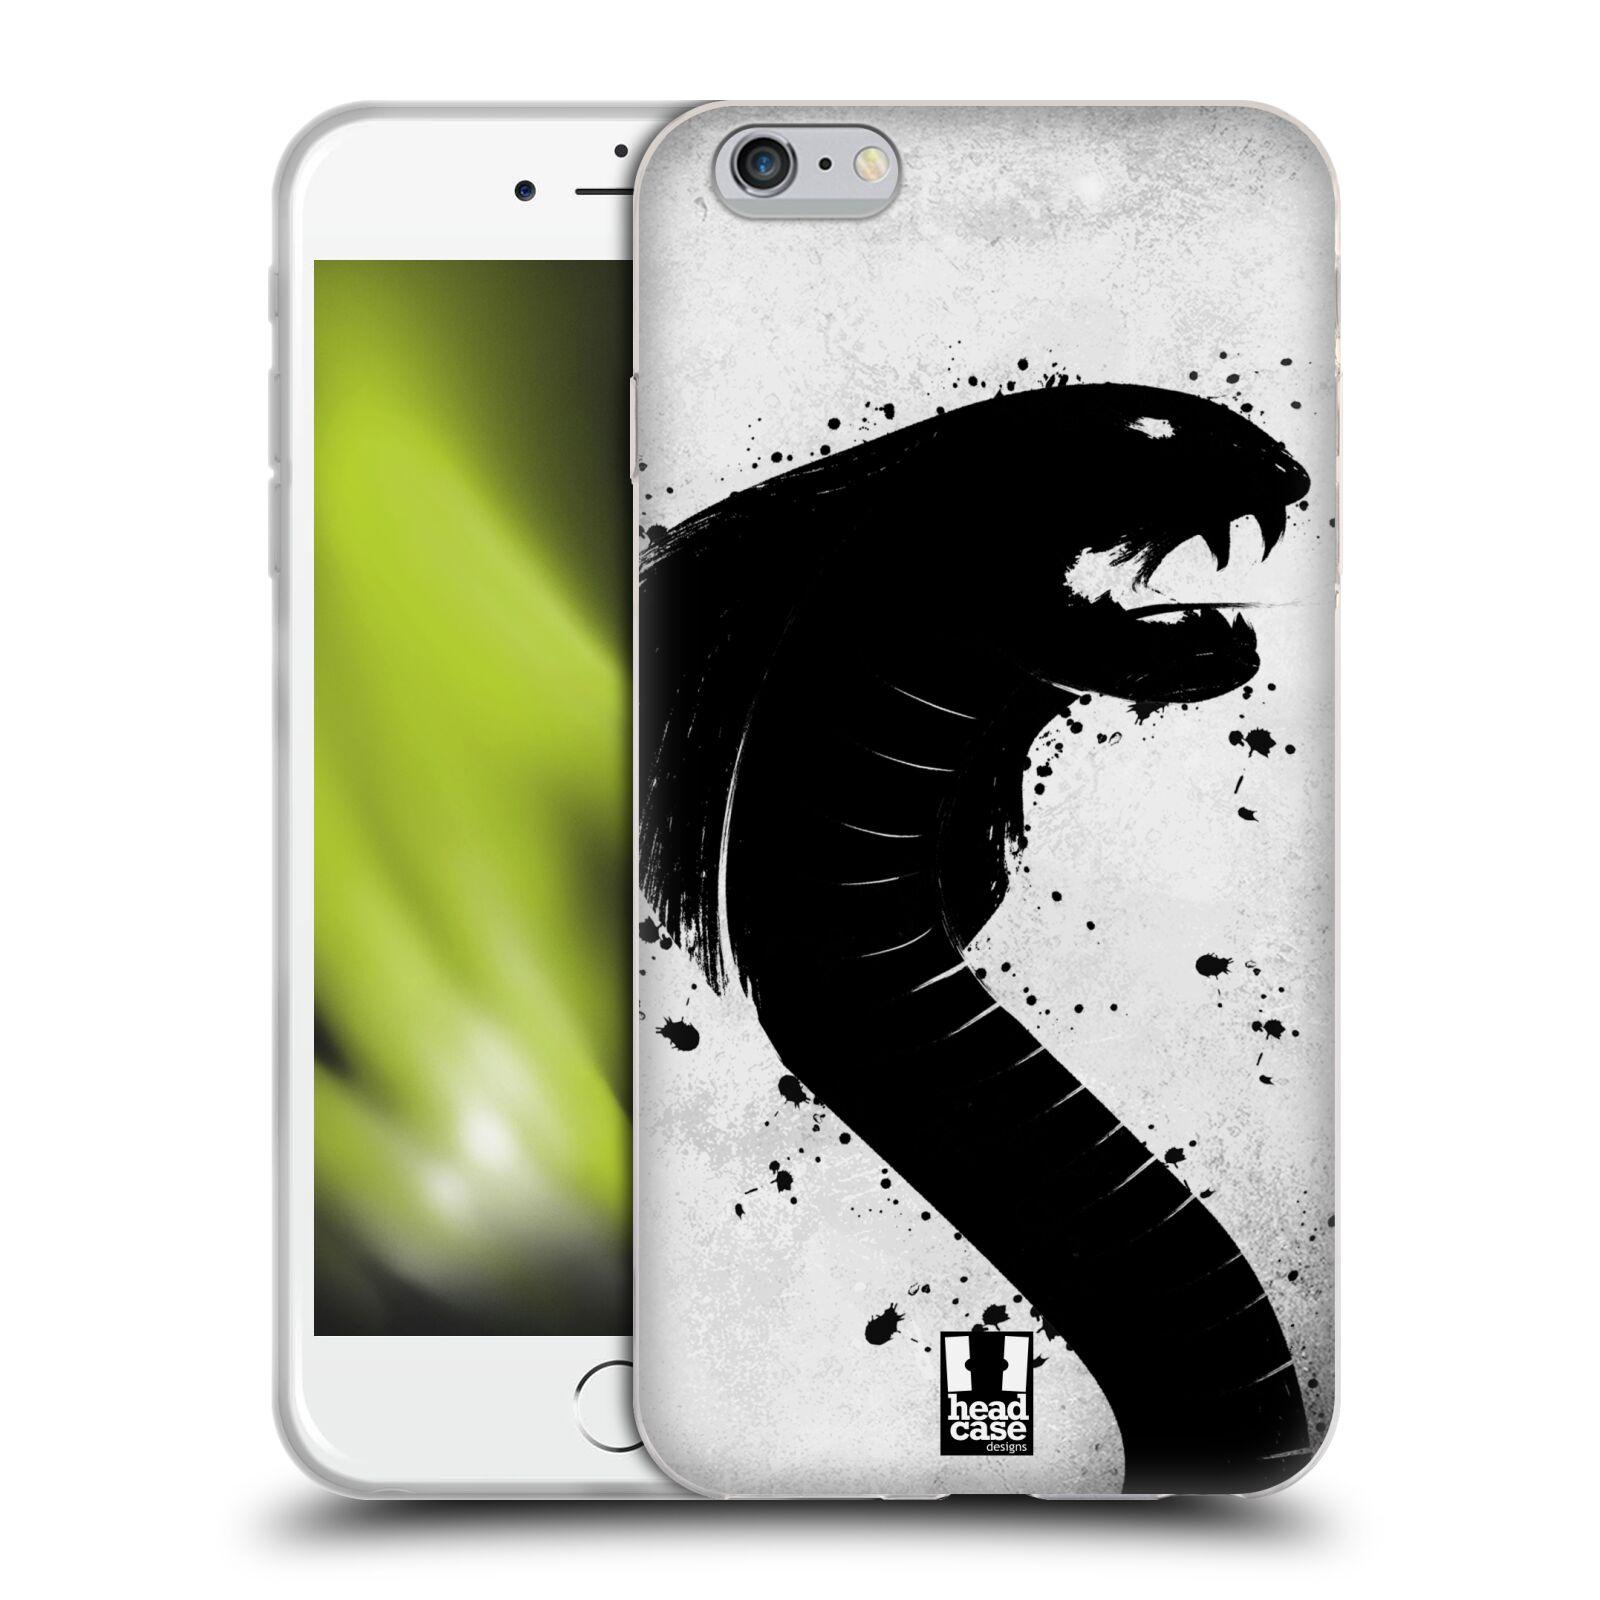 HEAD CASE silikonový obal na mobil Apple Iphone 6 PLUS/ 6S PLUS vzor Kresba tuš zvíře had kobra